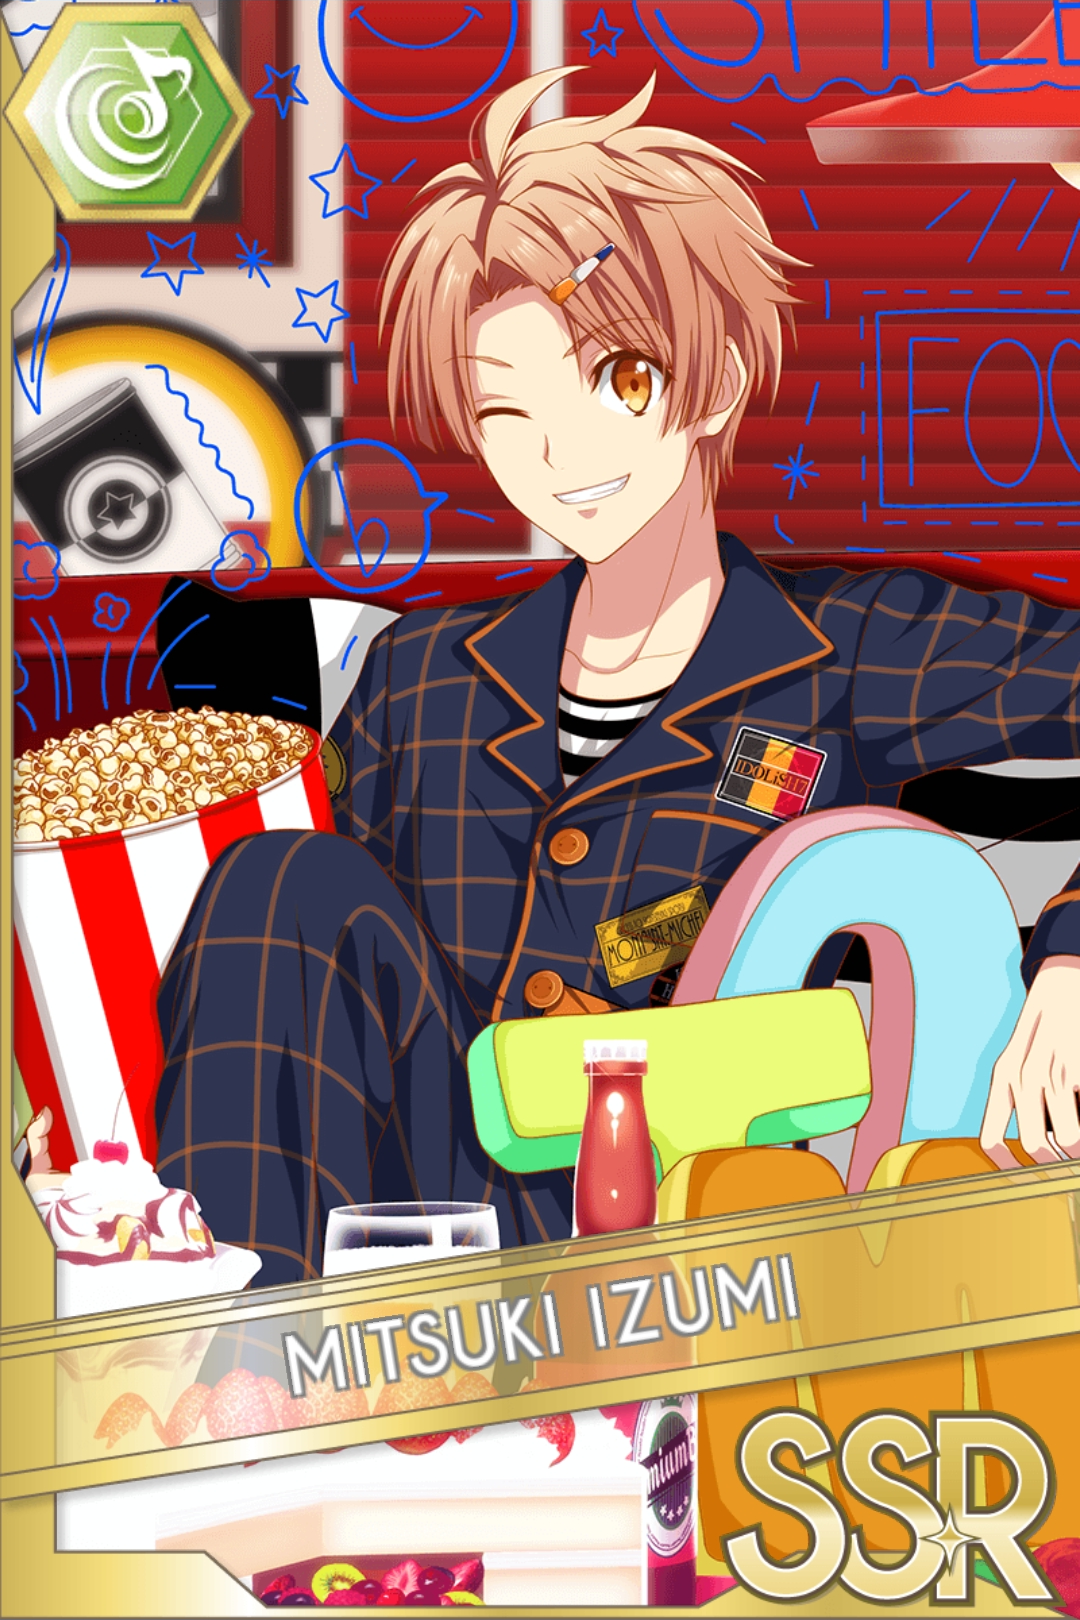 Mitsuki Izumi (Photogenic Life)